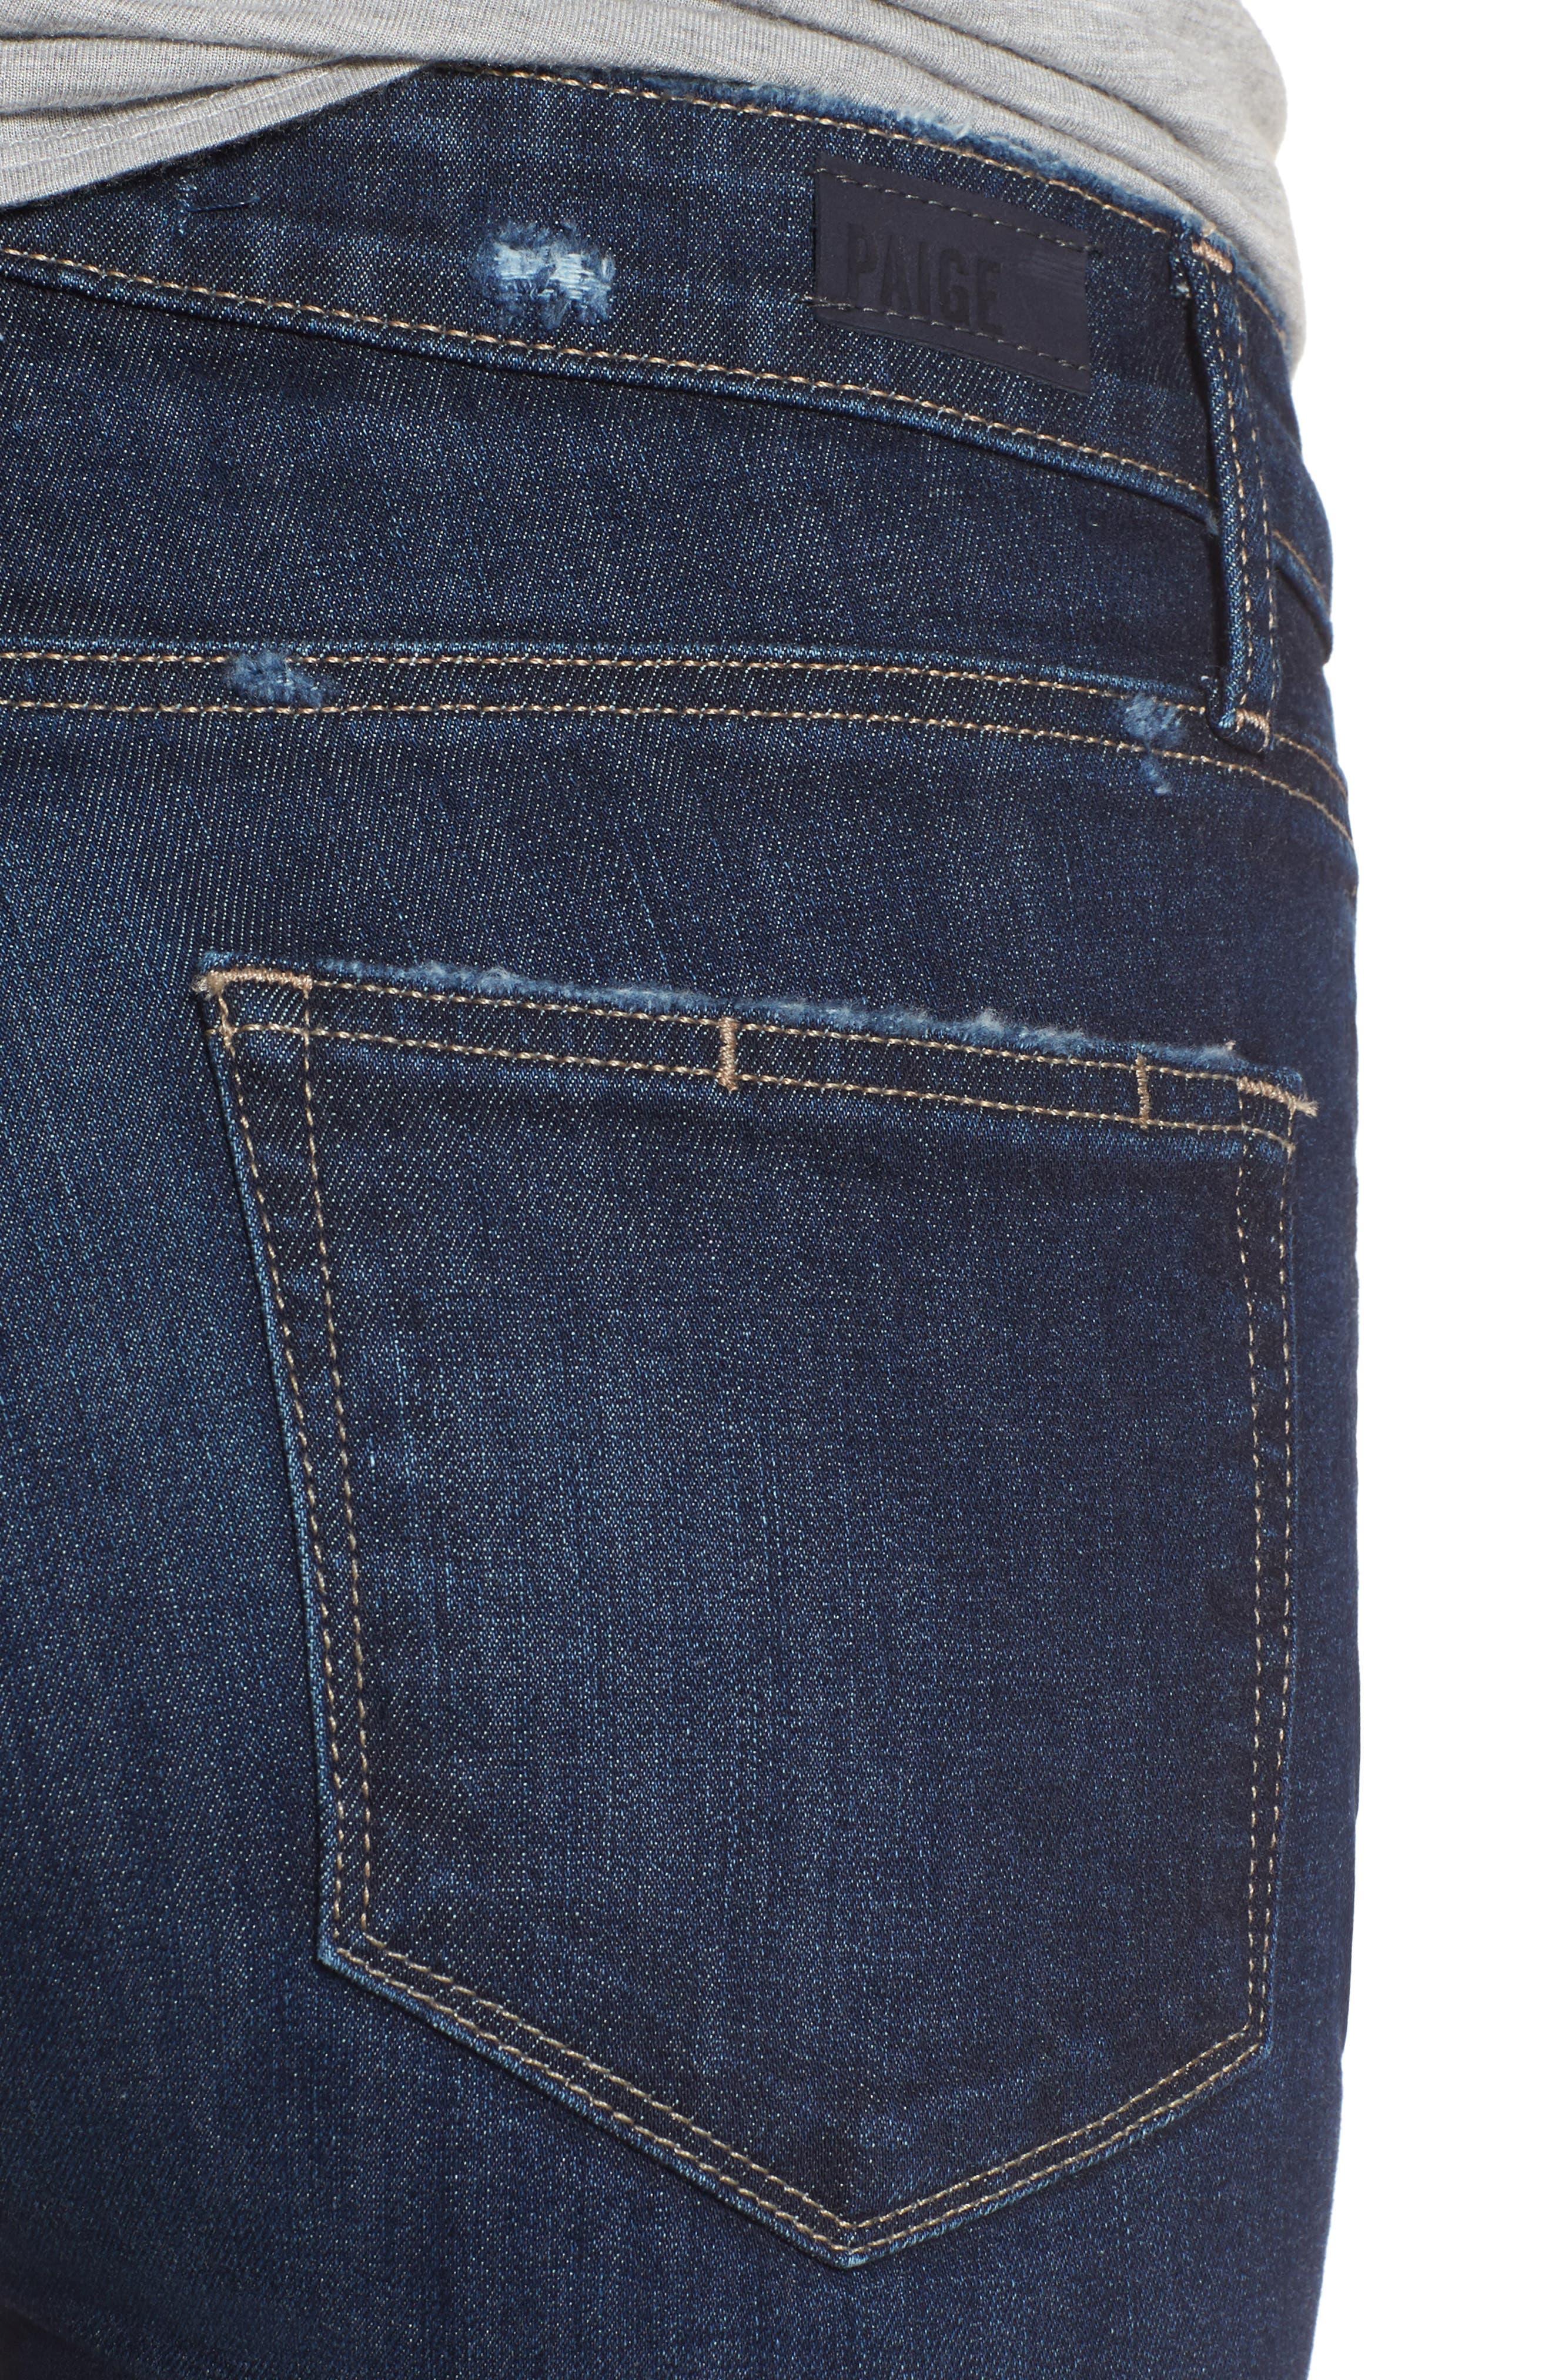 Margot High Waist Ankle Skinny Jeans,                             Alternate thumbnail 4, color,                             Davidson Destructed